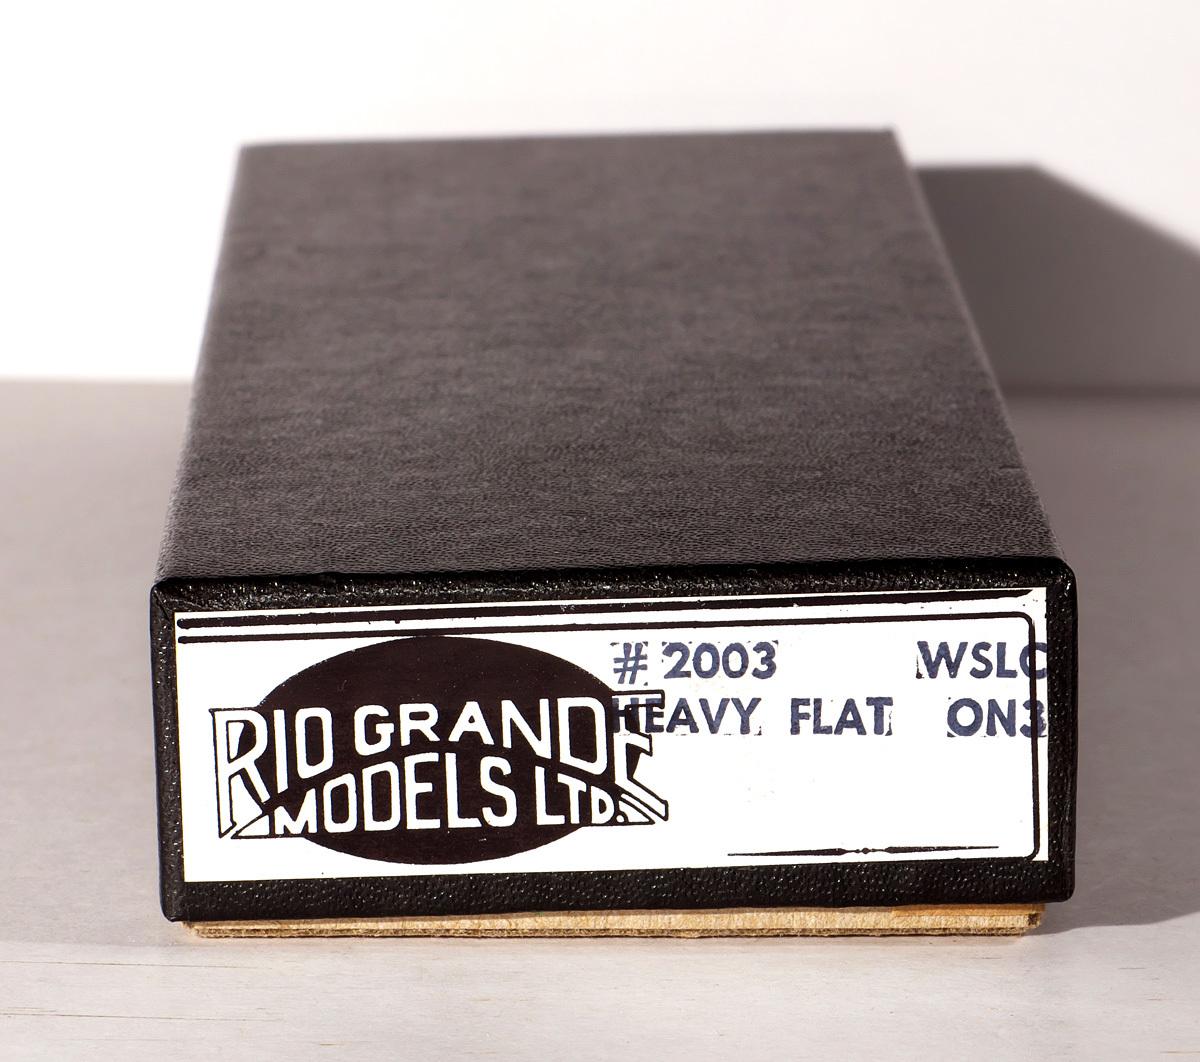 On3 KIT HEAVY FLAT #2003 Rio Grande Models Ltd  小箱